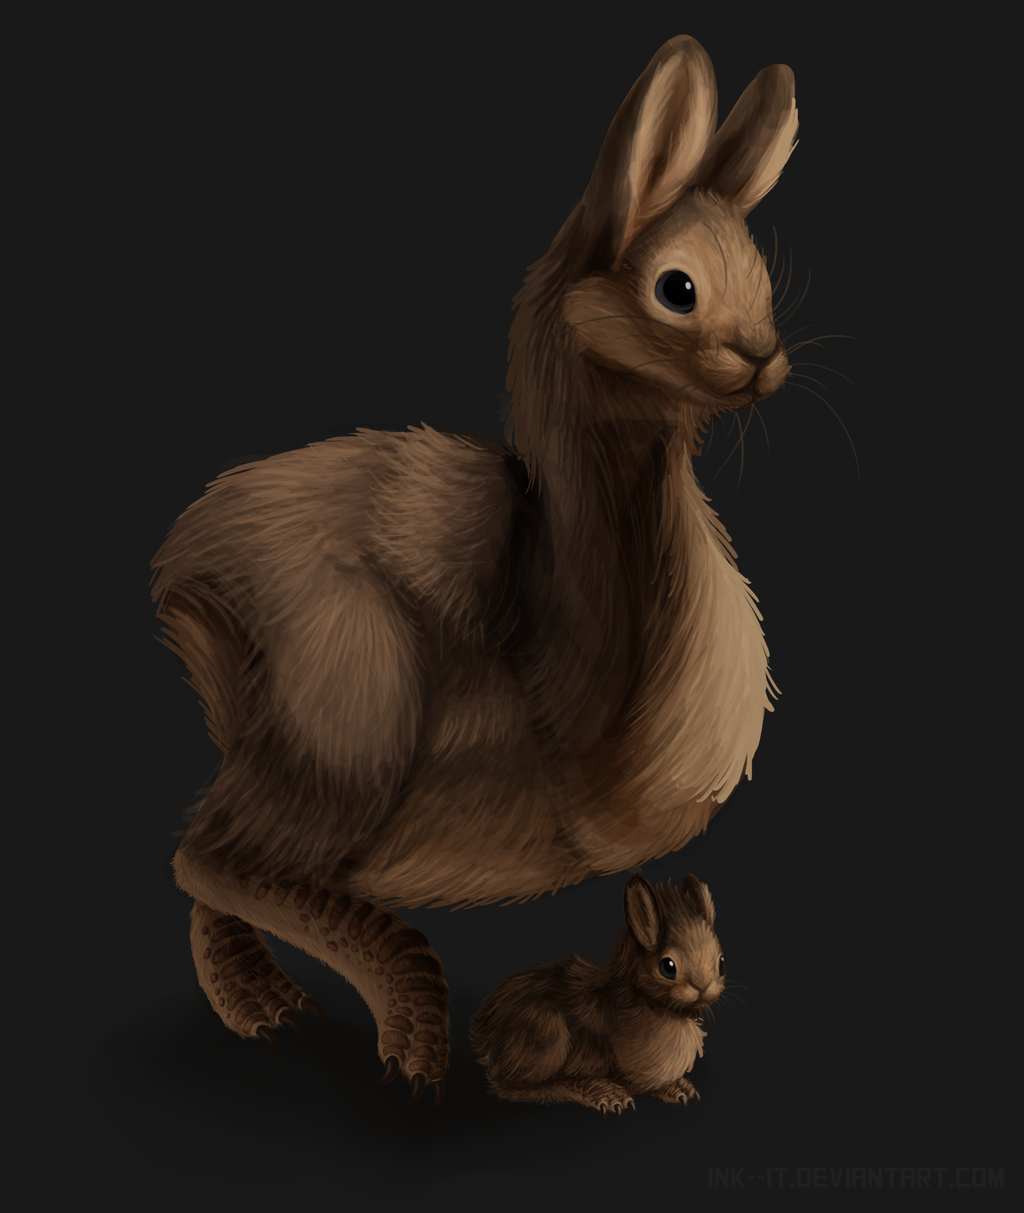 Garden Witch - Final Creature Concept by Ink--It on DeviantArt